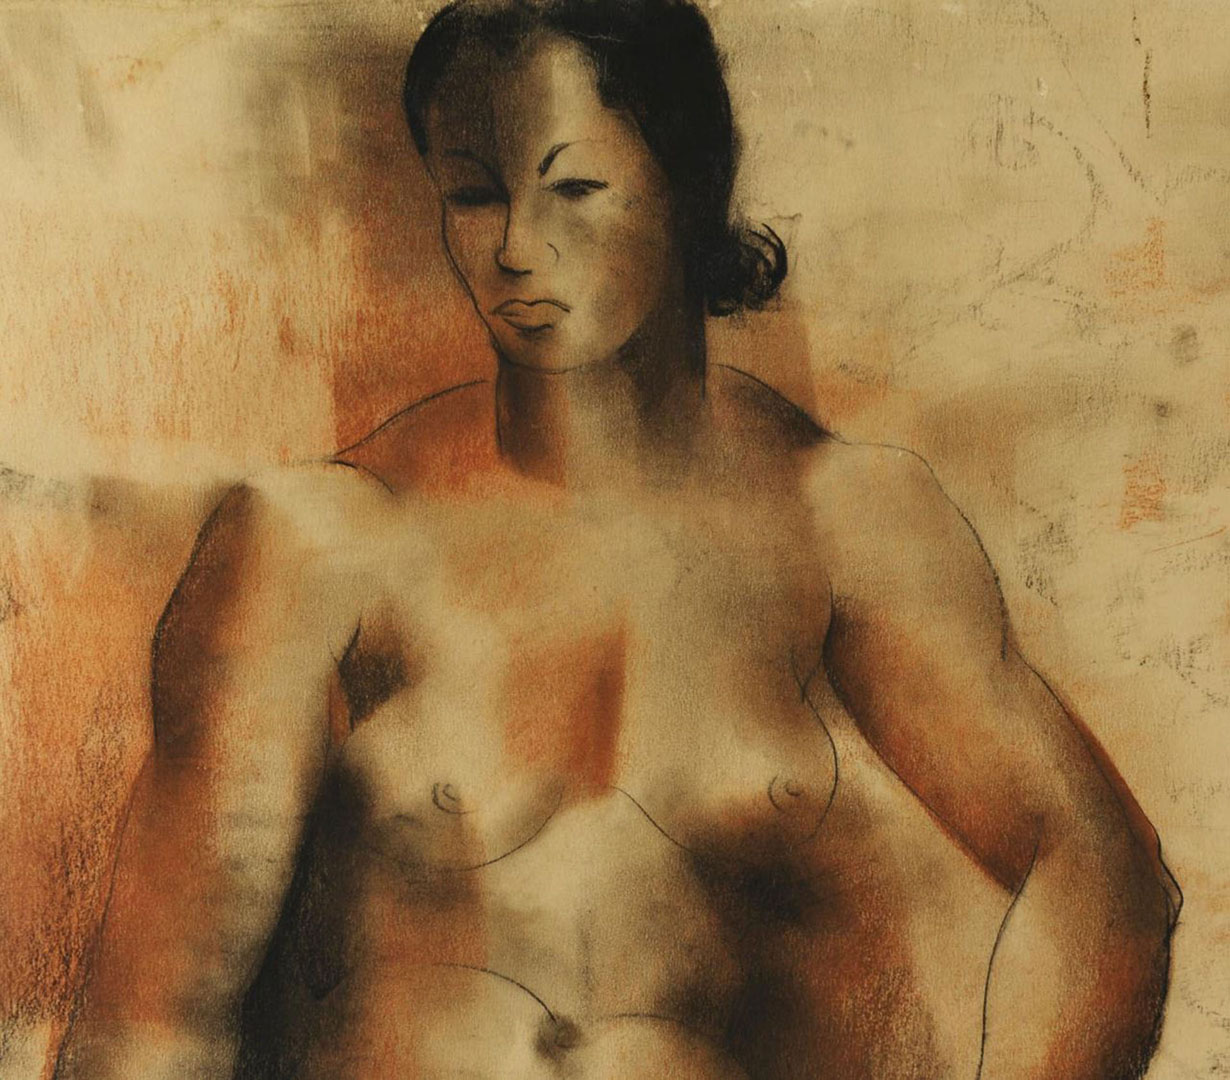 Lot 2872253: Abraham S. Baylinson Nude Pastel